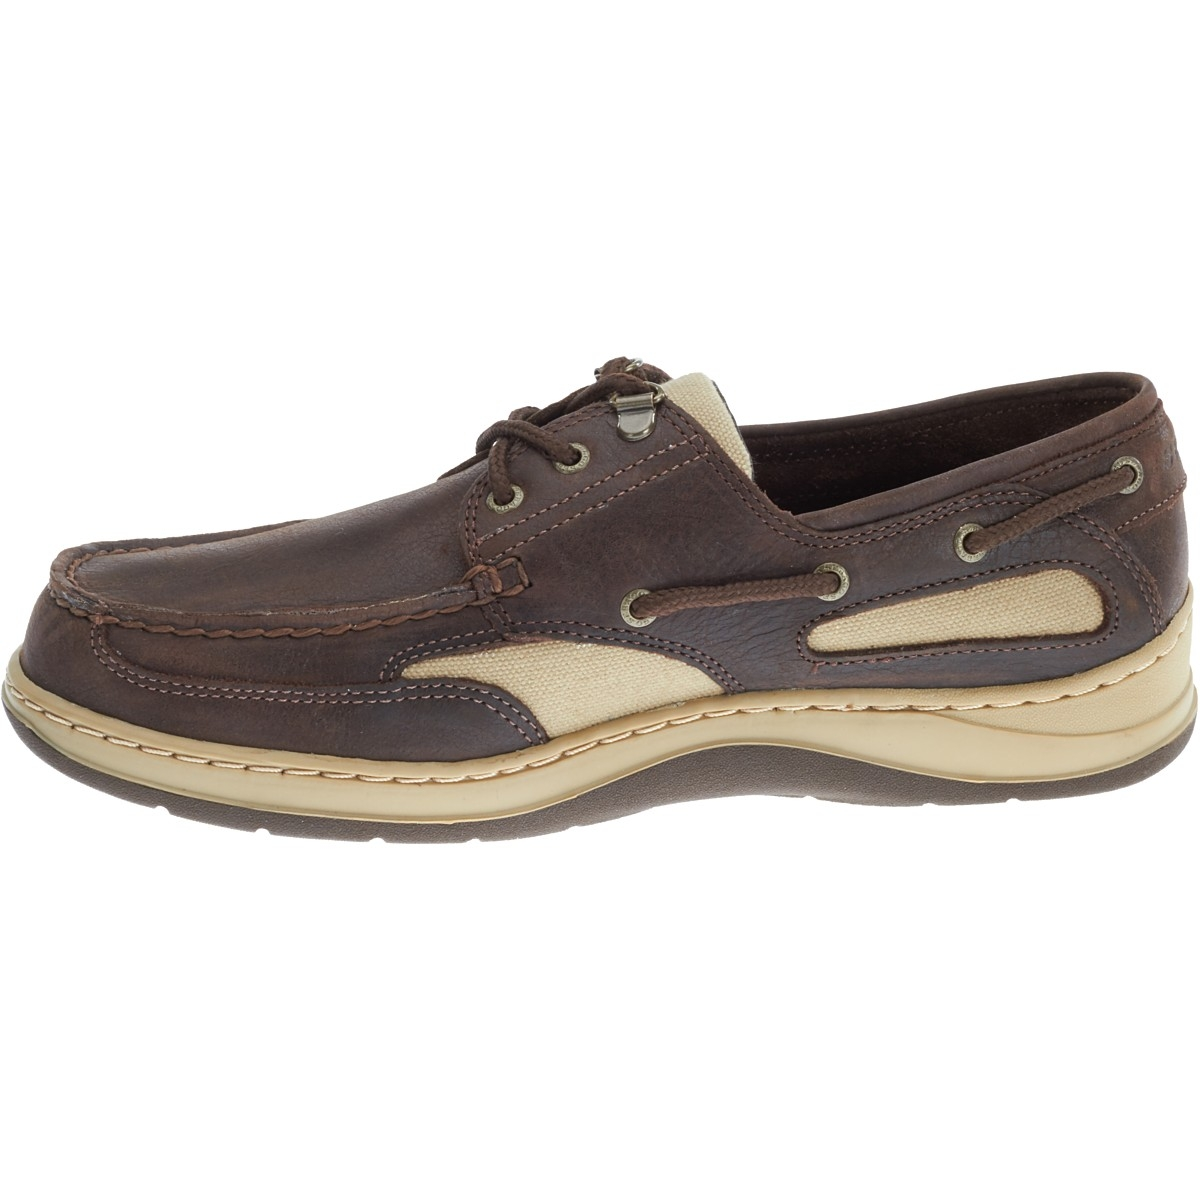 Sebago Men S Clovehitch Ii Boat Shoe